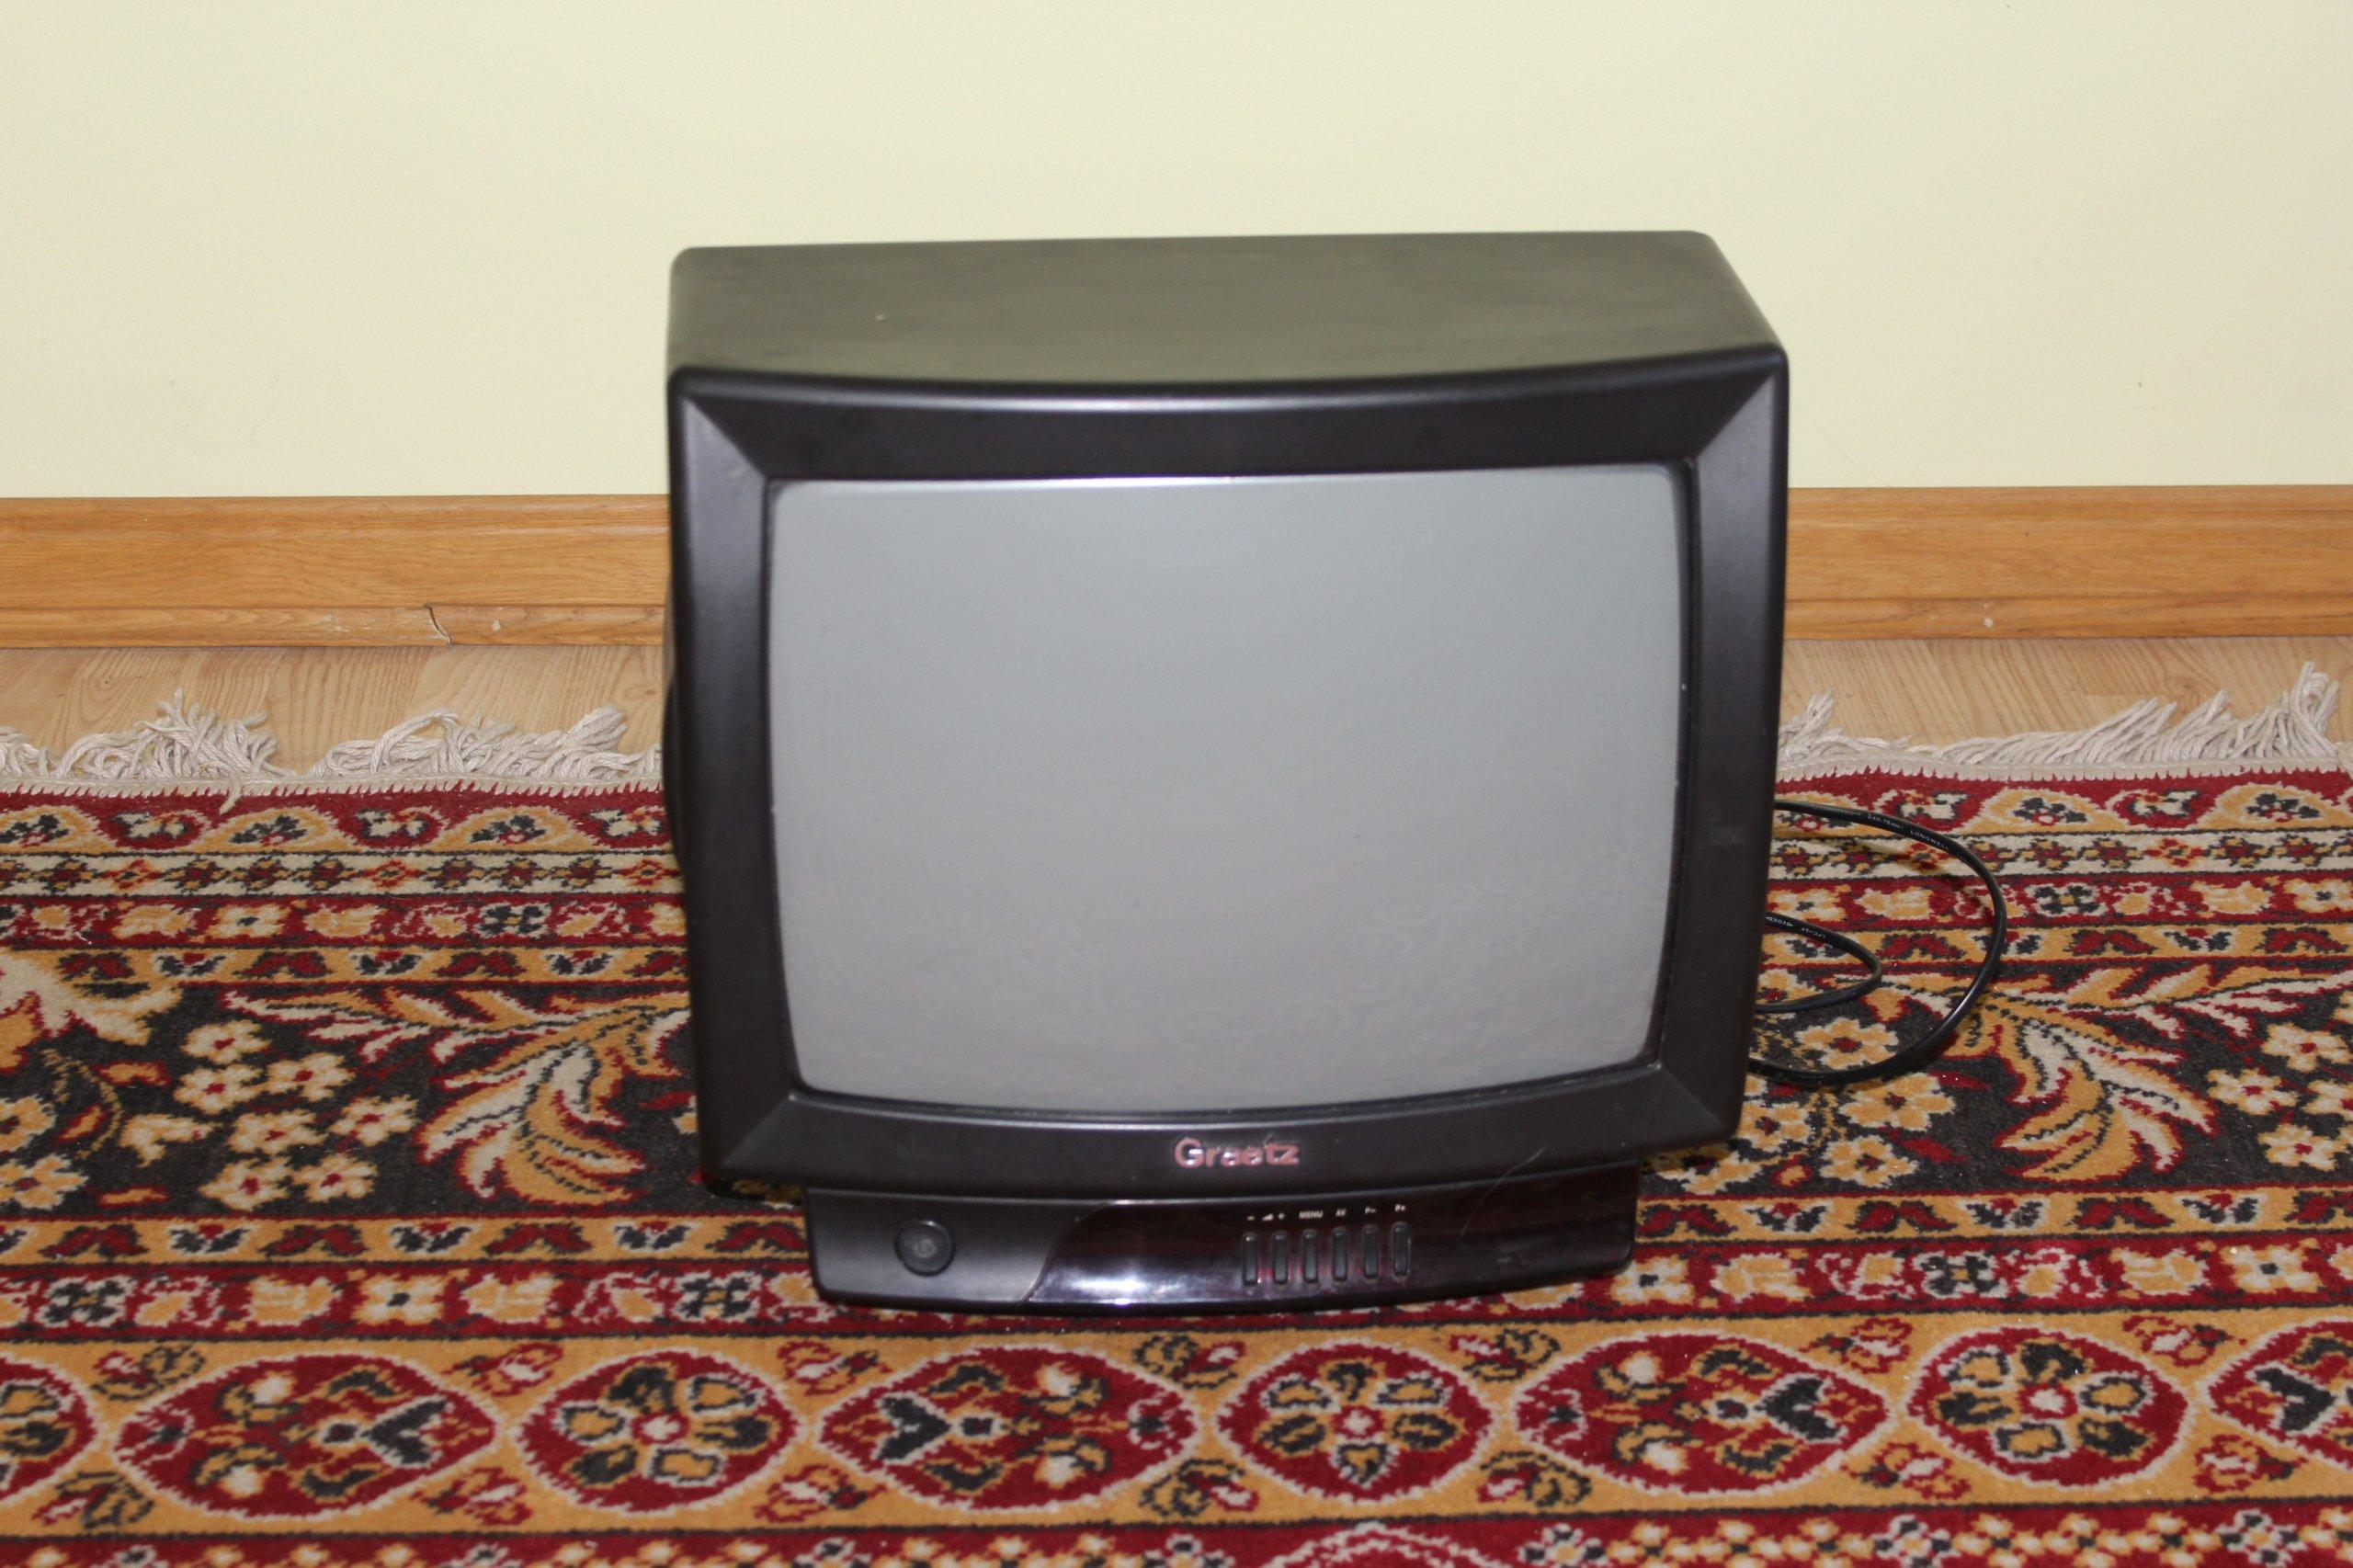 Telewizor - Graetz - 14 cali